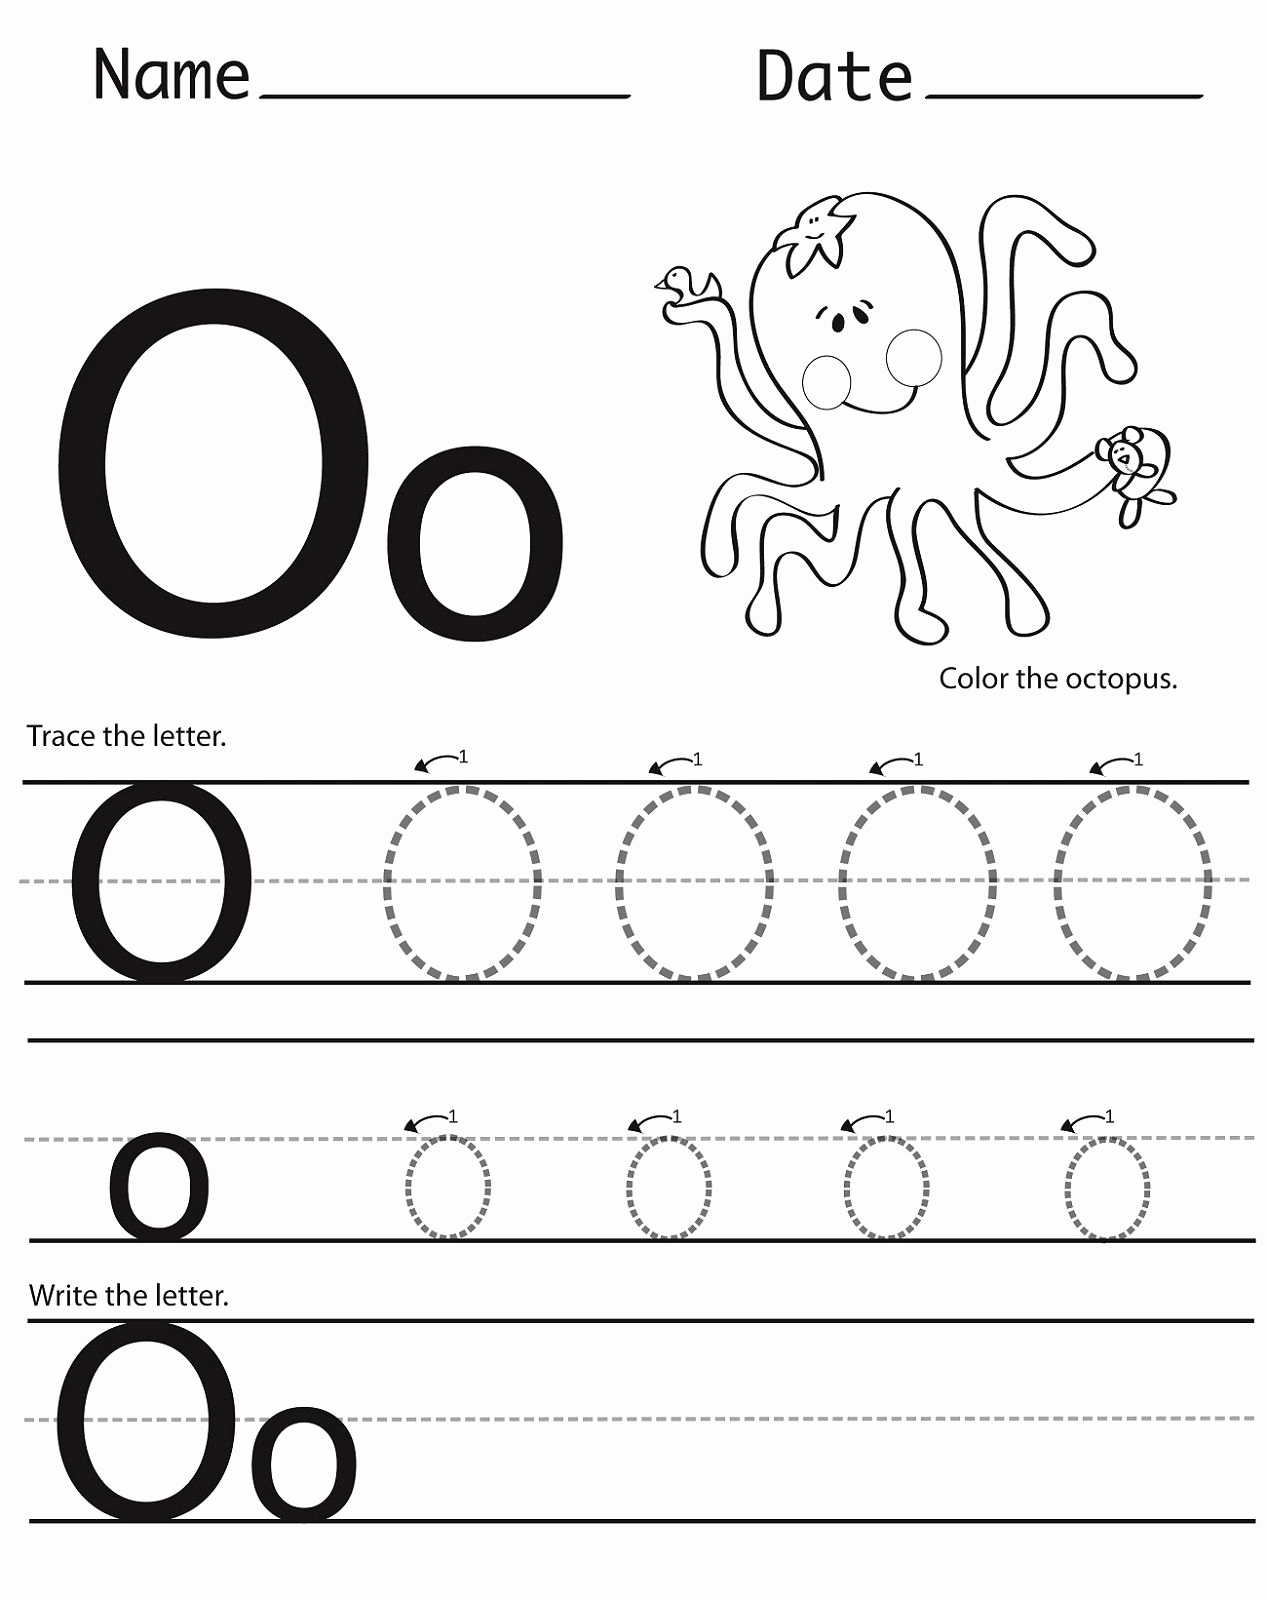 Letter O Worksheet for Kindergarten Beautiful Trace Letter O Worksheets Preschool